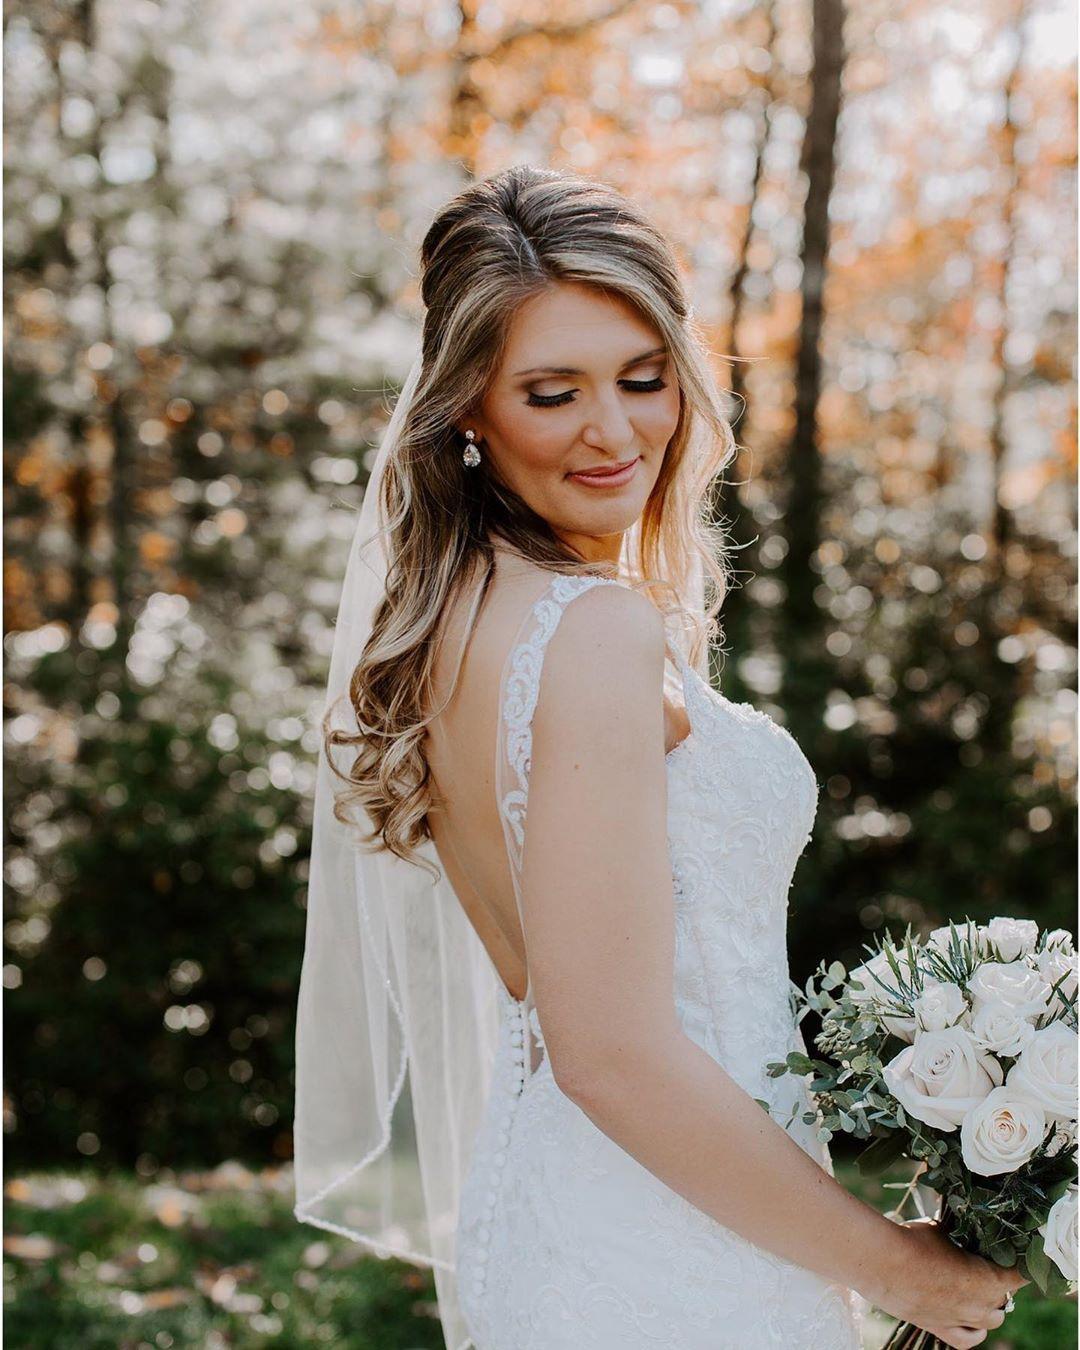 That glow though! • Loving this bridal hair + airbrush